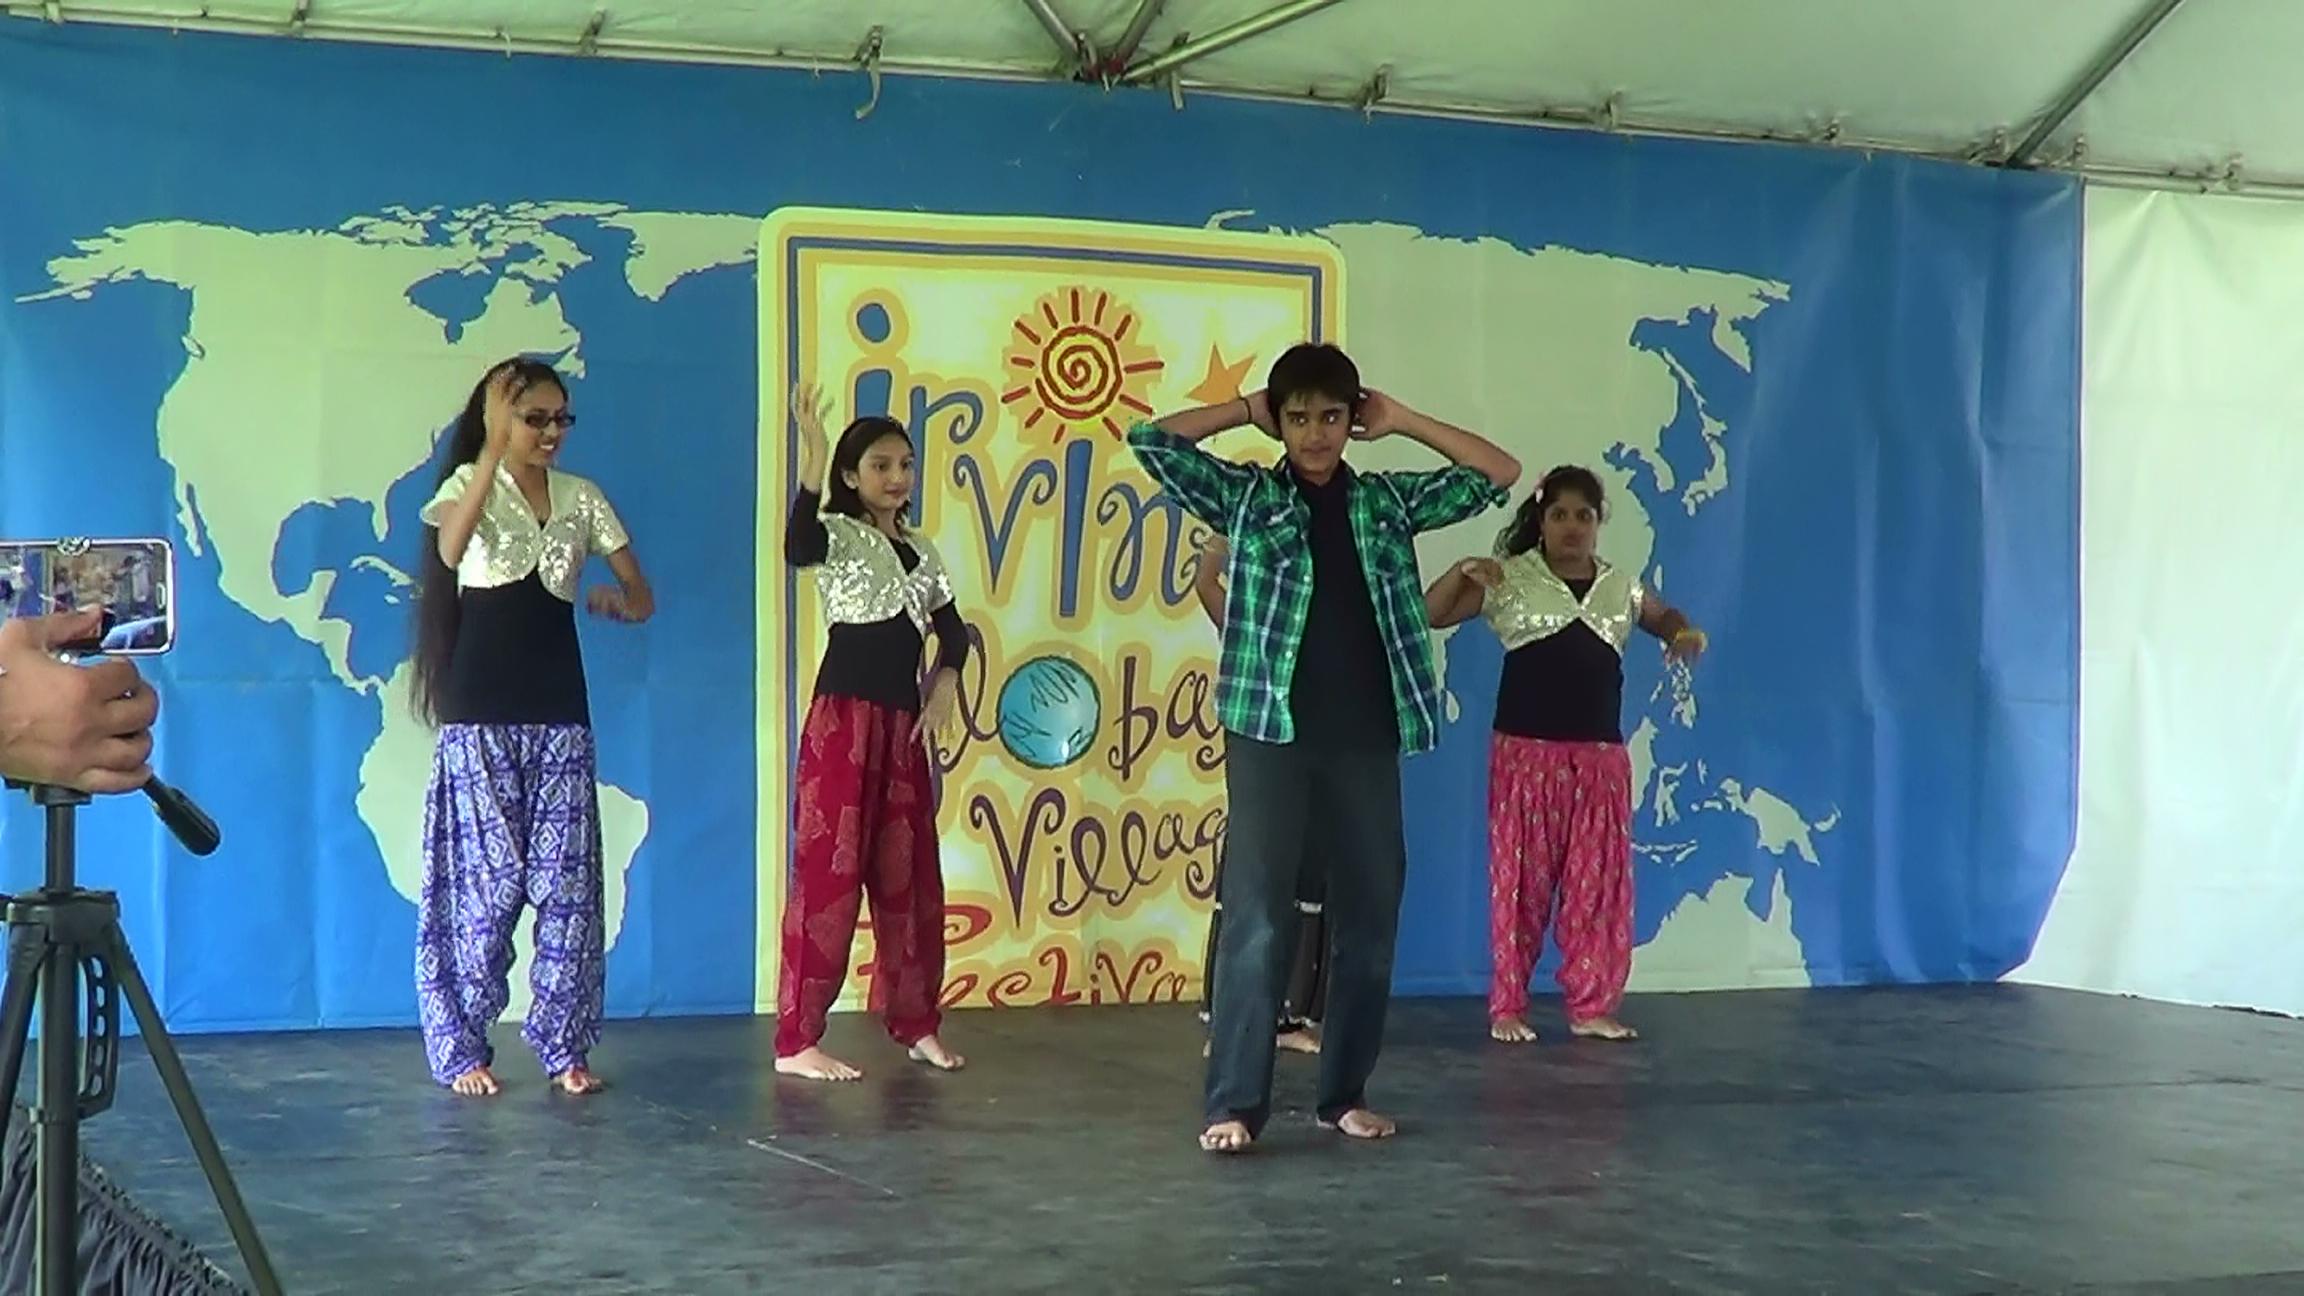 Irvine Global Village Festival 2014